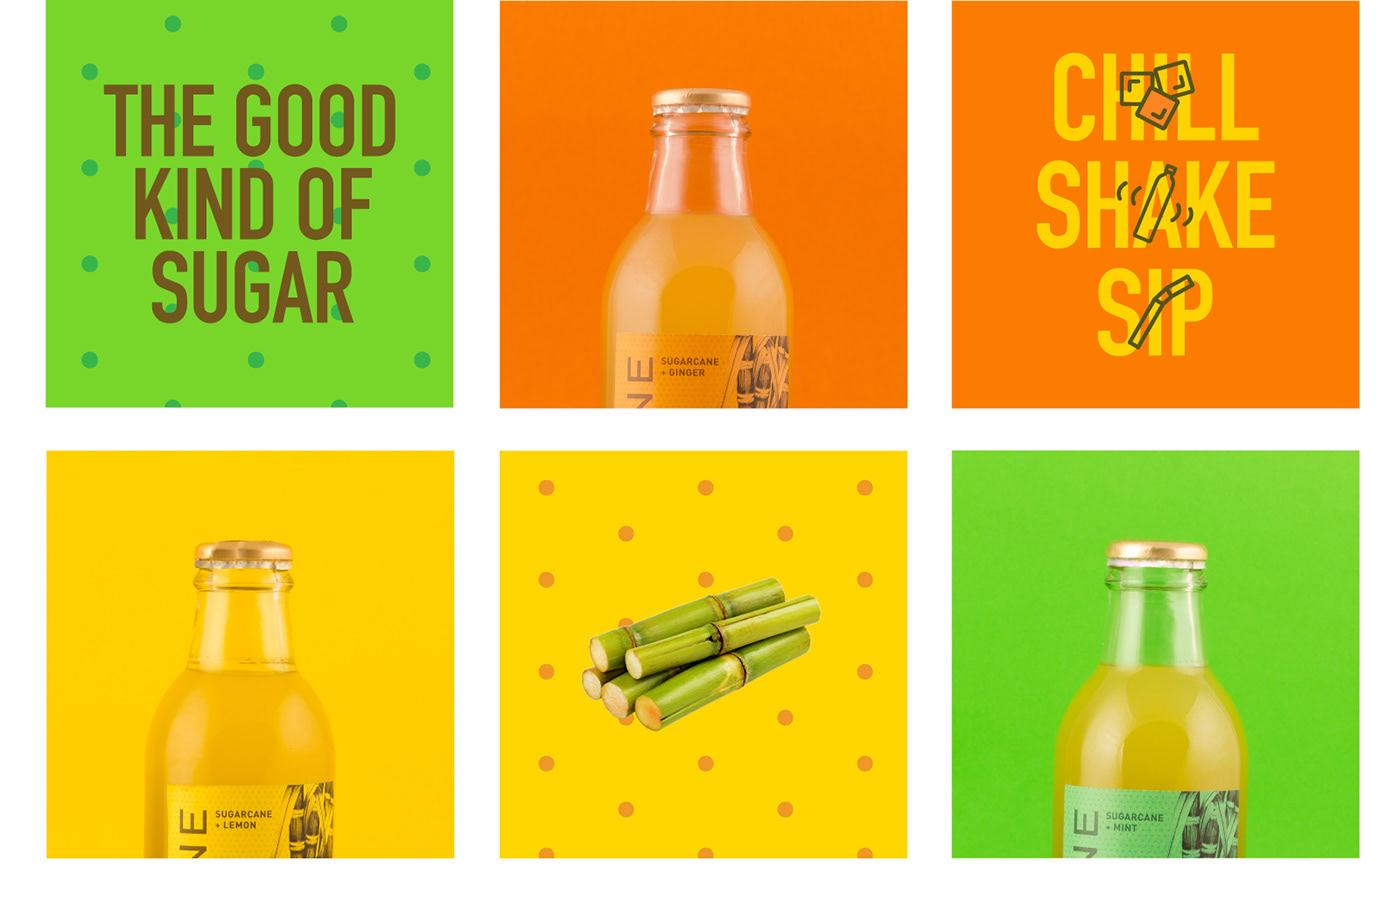 adobeawards juice Packaging Sugarcane type pure natural design healthy